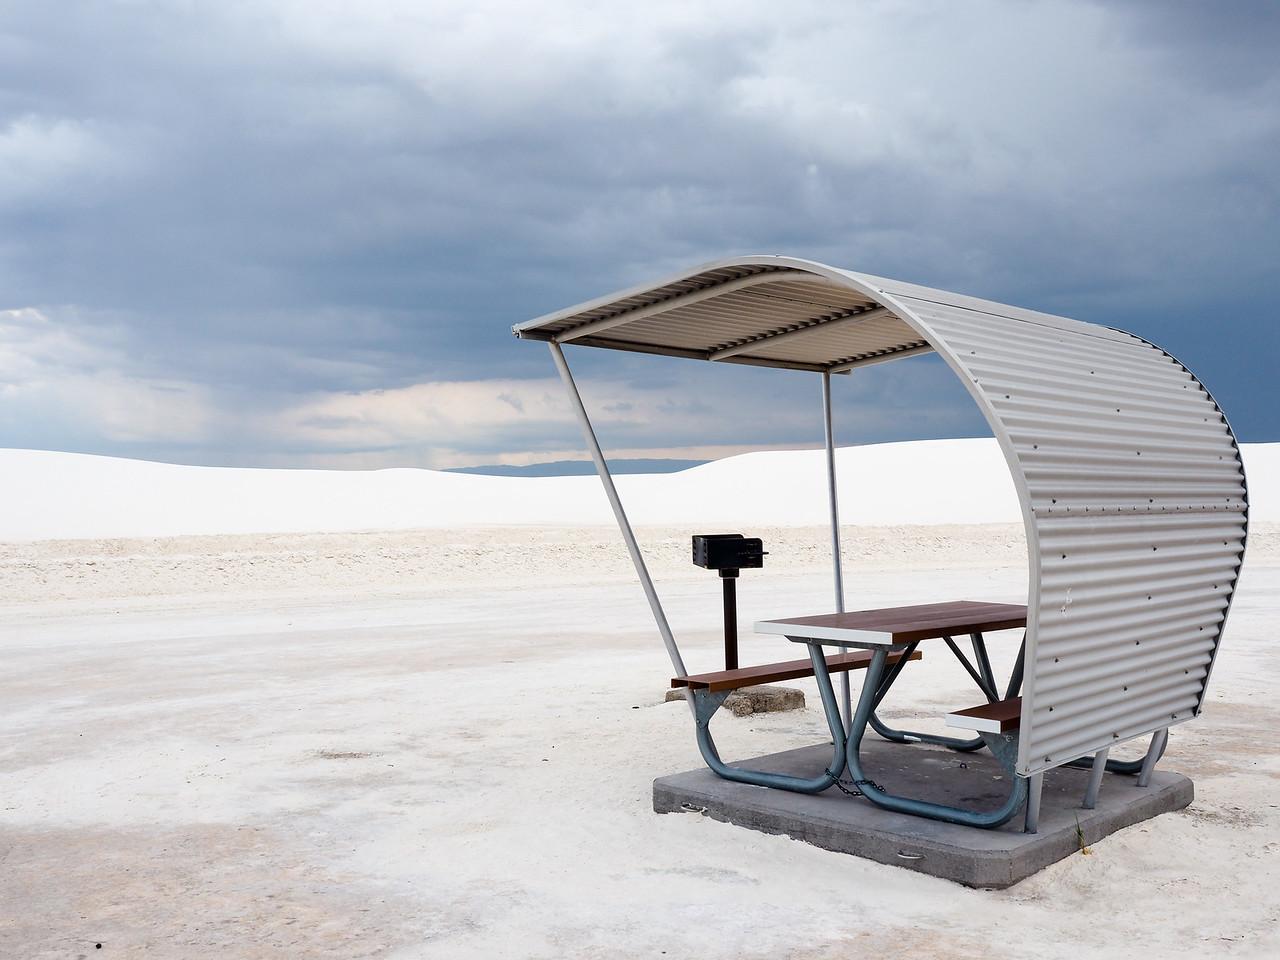 Picnic spot at White Sands National Park